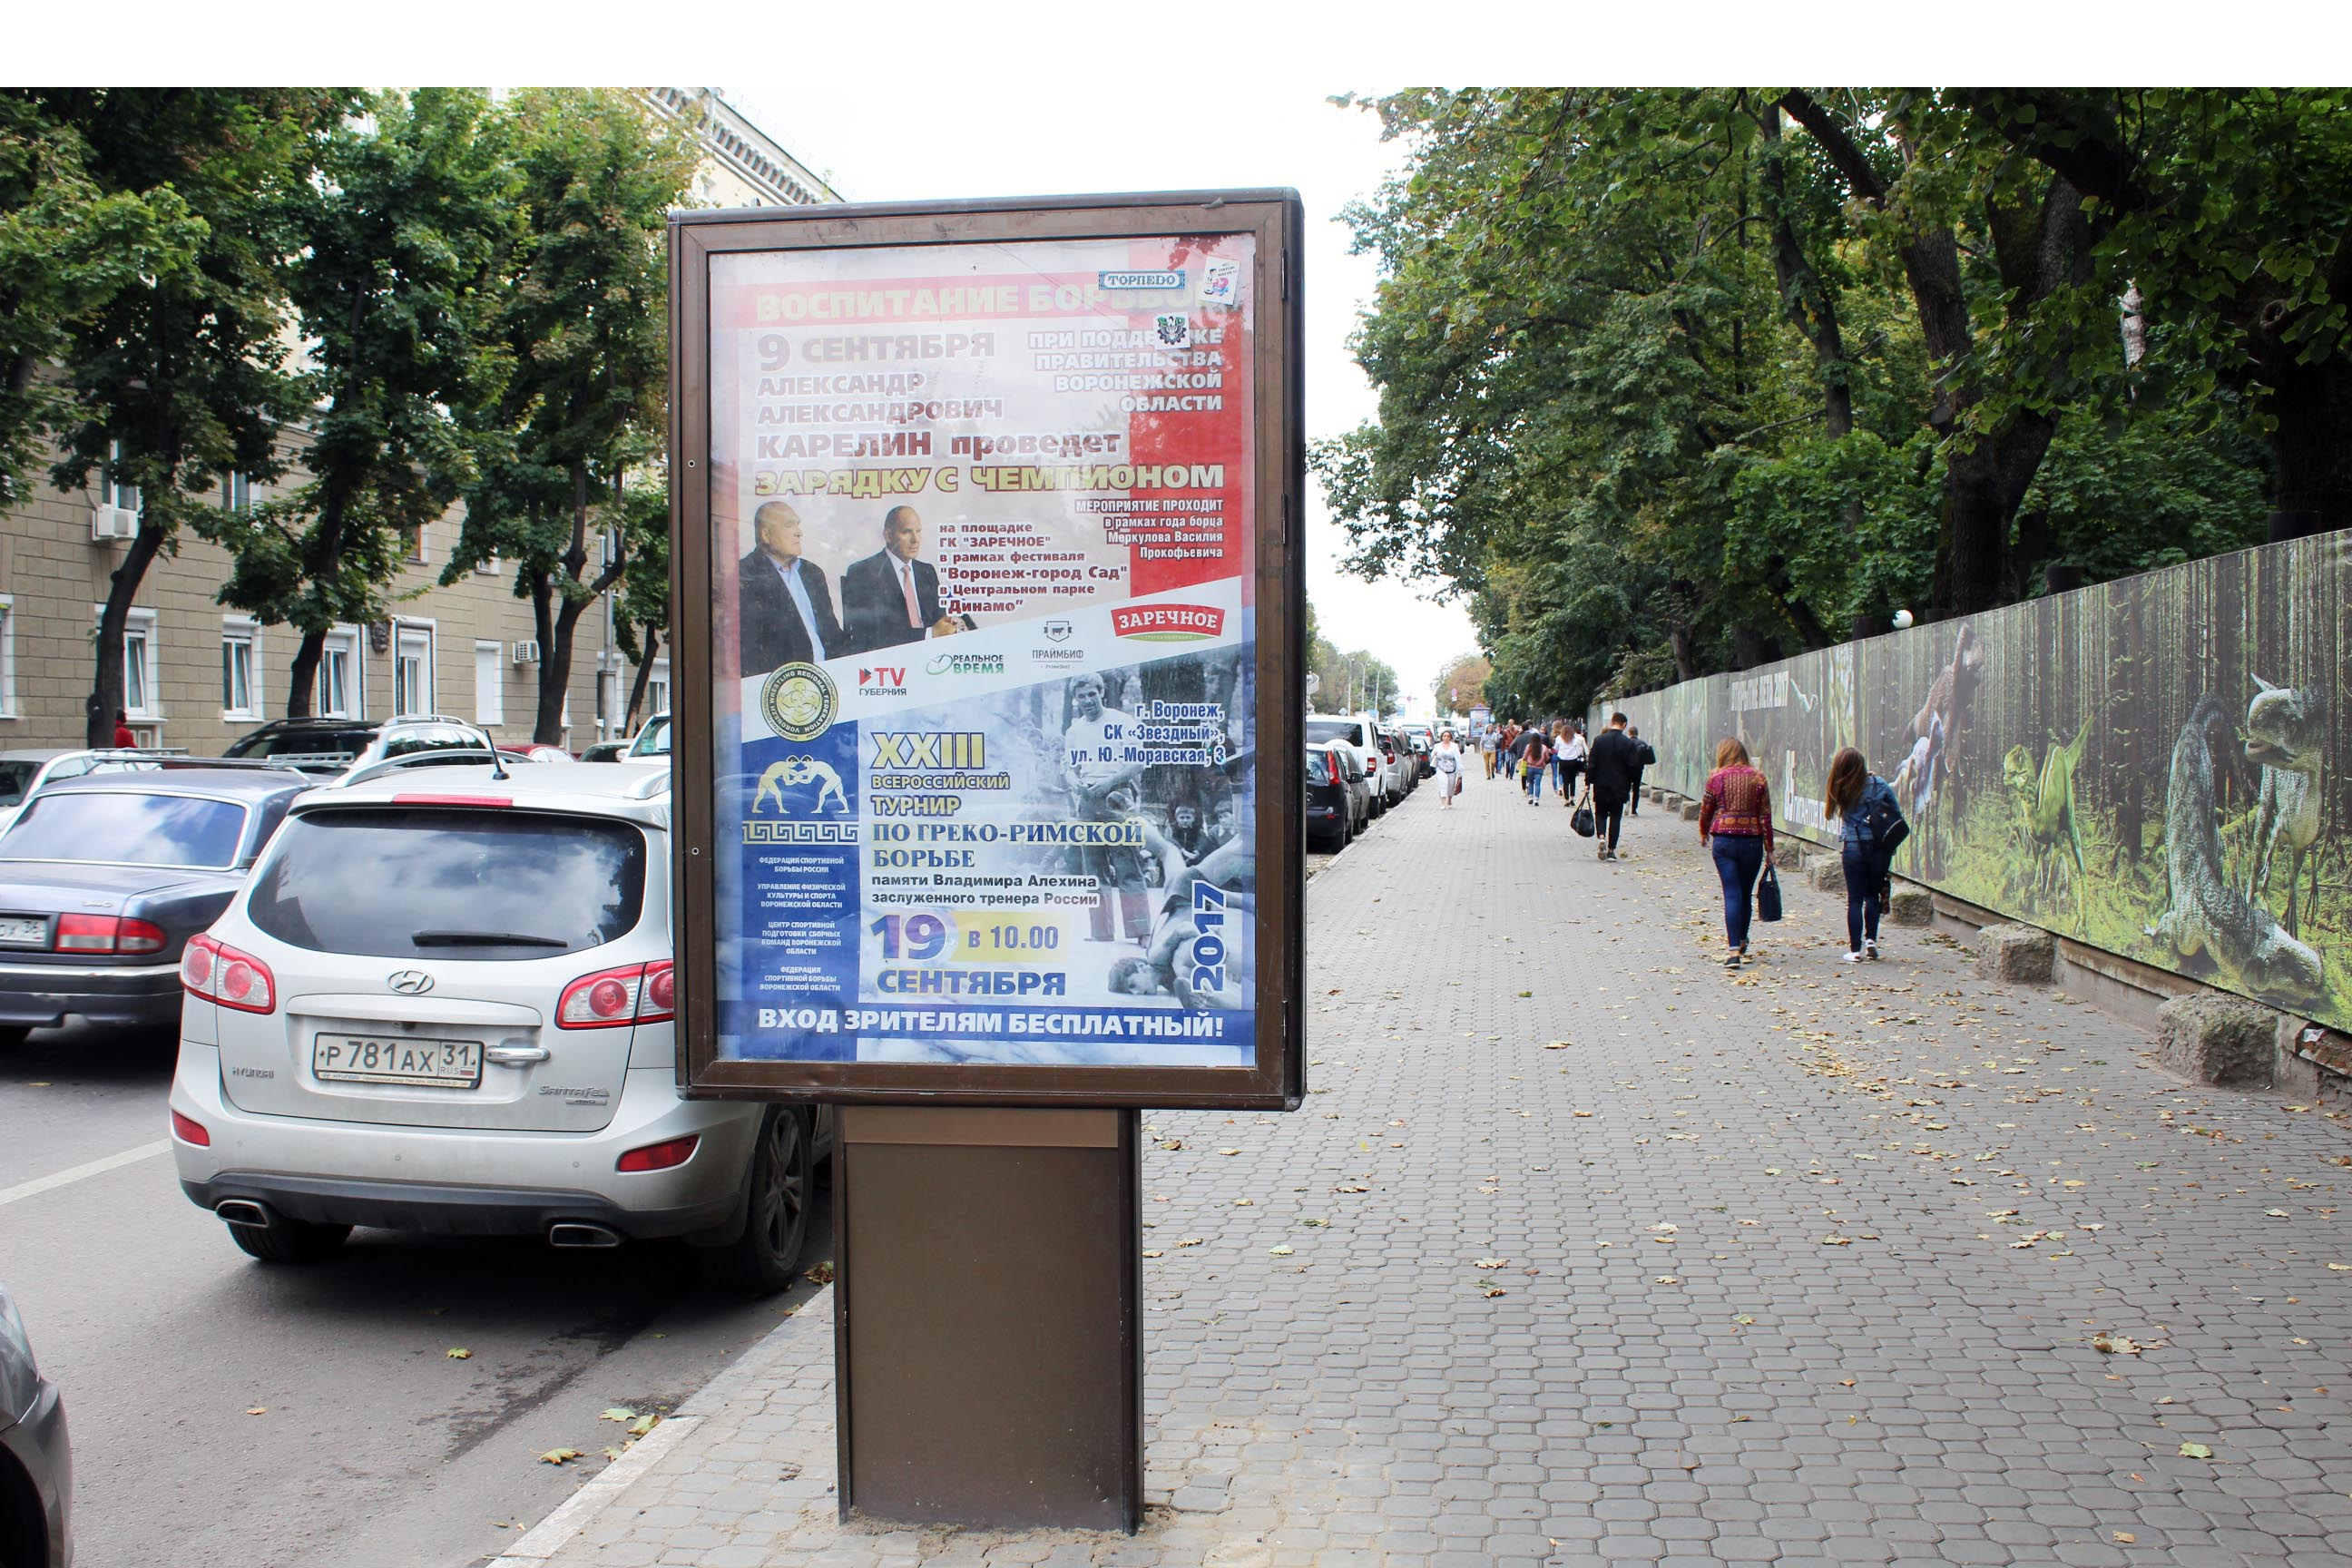 217А ул. Феоктистова д. 2